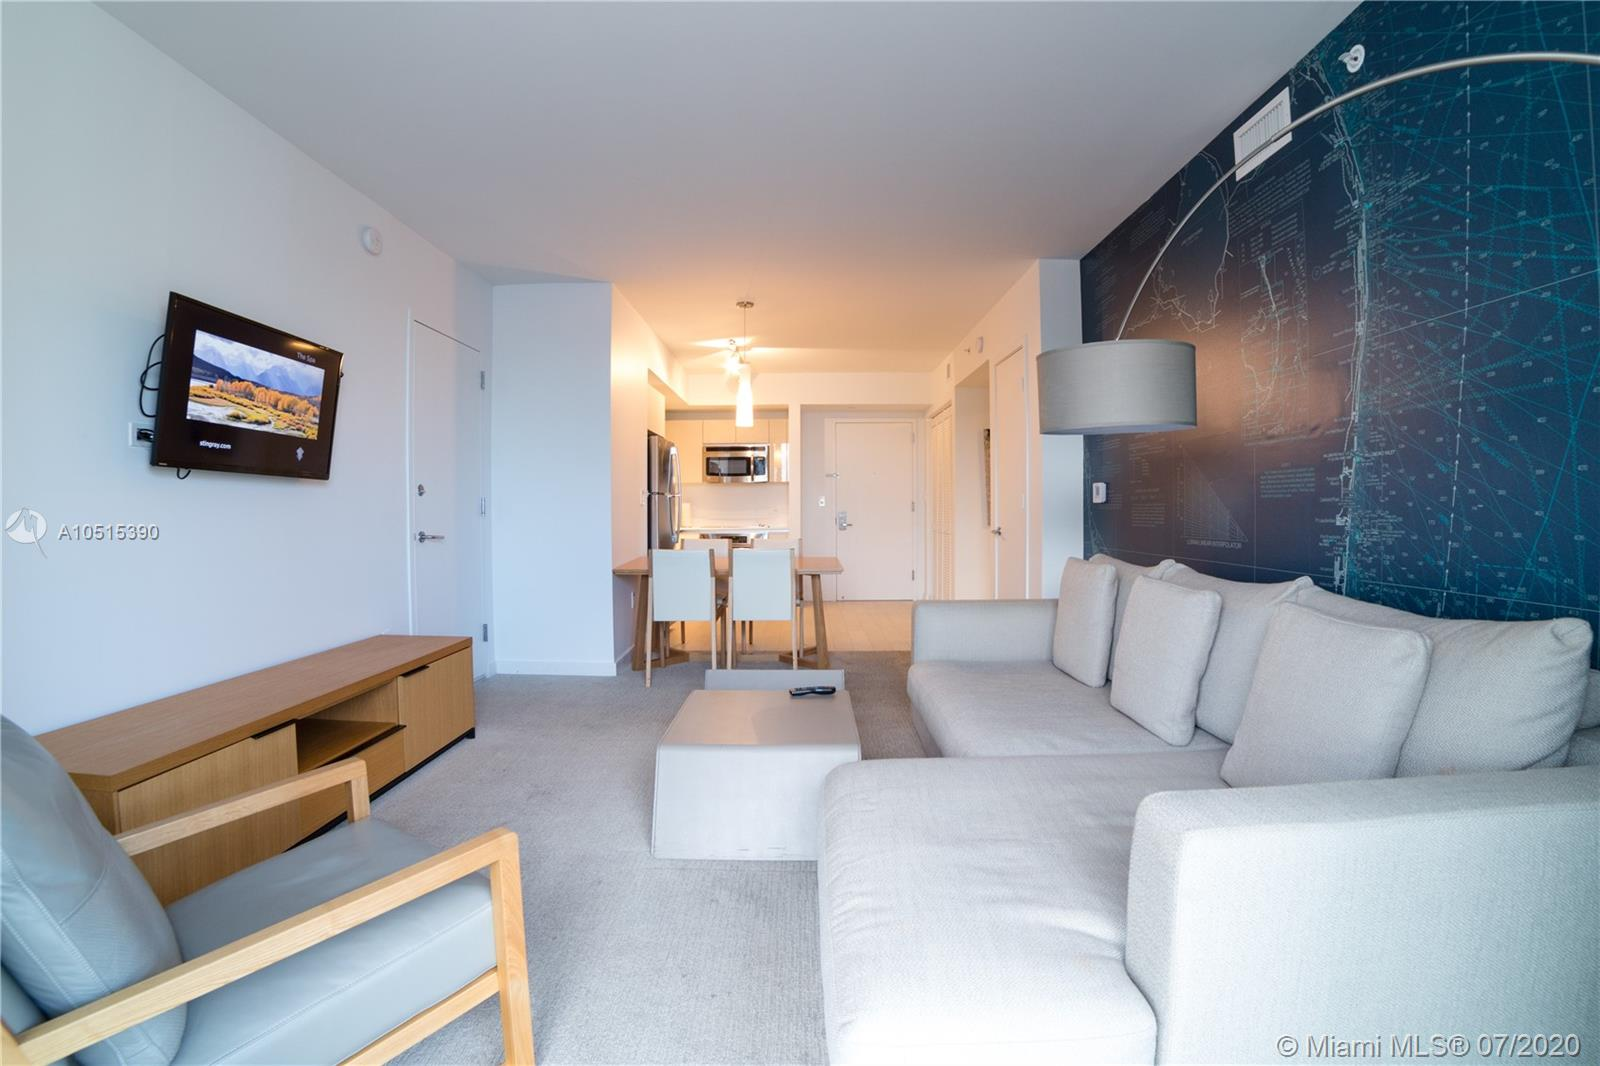 2602 E Hallandale Beach, Hallandale Beach, Florida 33009, 2 Bedrooms Bedrooms, ,2 BathroomsBathrooms,Rental,For Rent,2602 E Hallandale Beach,A10515390